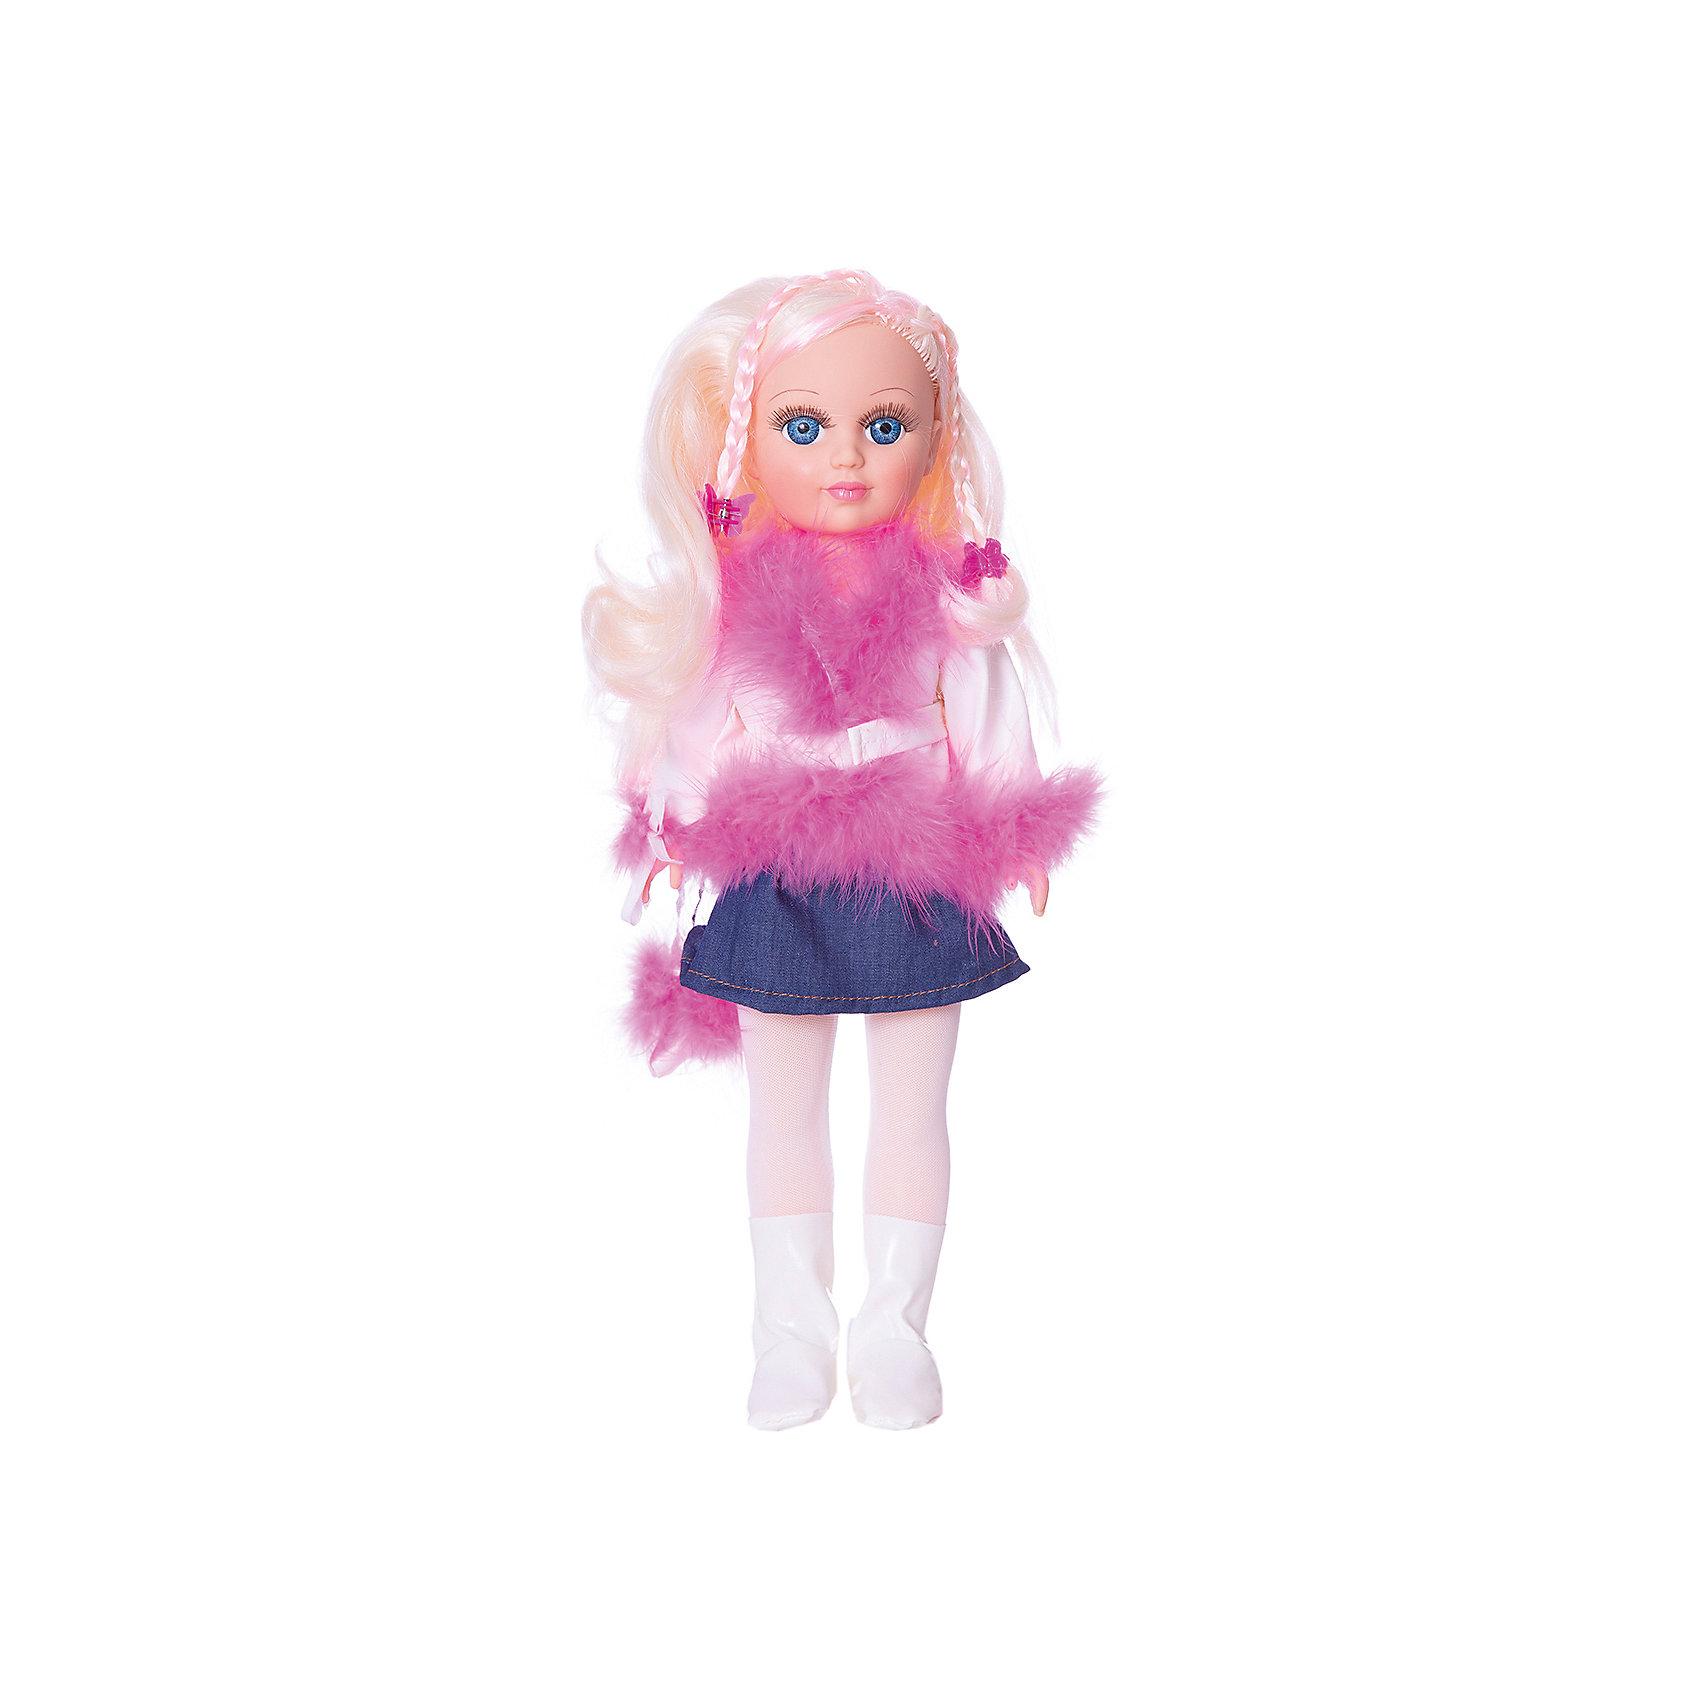 Весна Кукла Анастасия, со звуком, 40 см, Весна весна 35 см